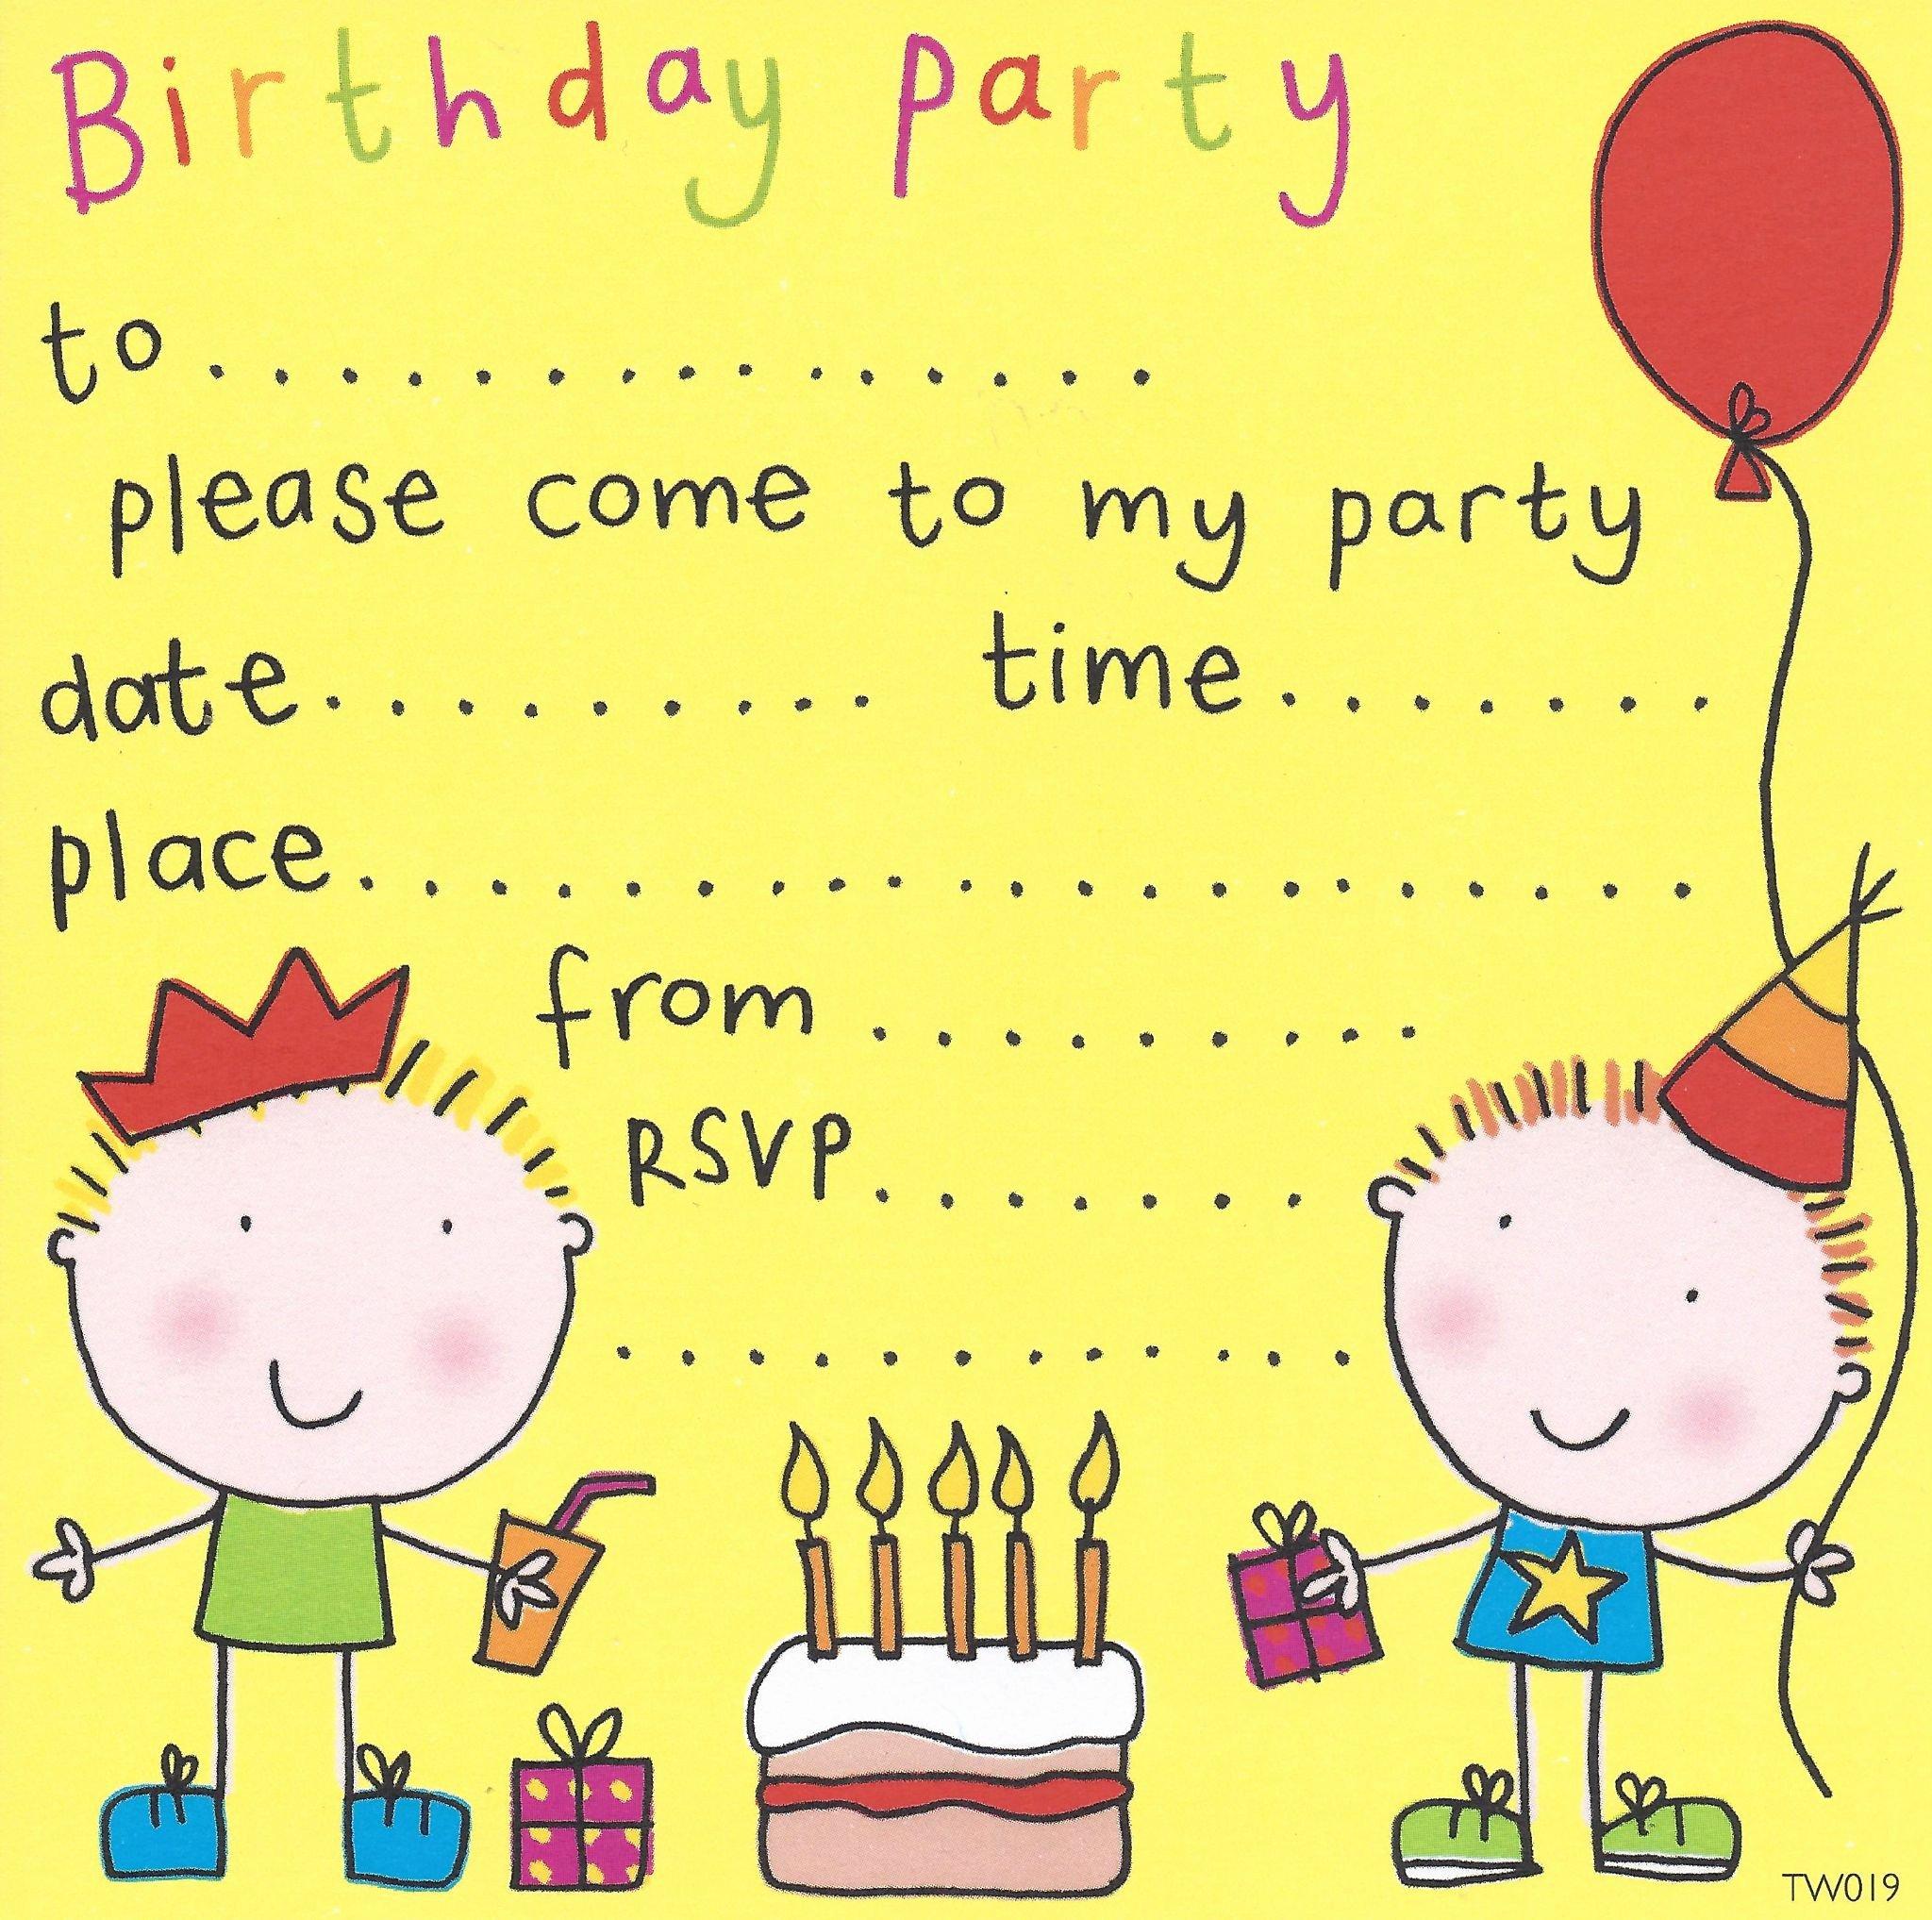 Free Party Invitation Templates Elegant Free Birthday Party Invites for Kids – Free Printable